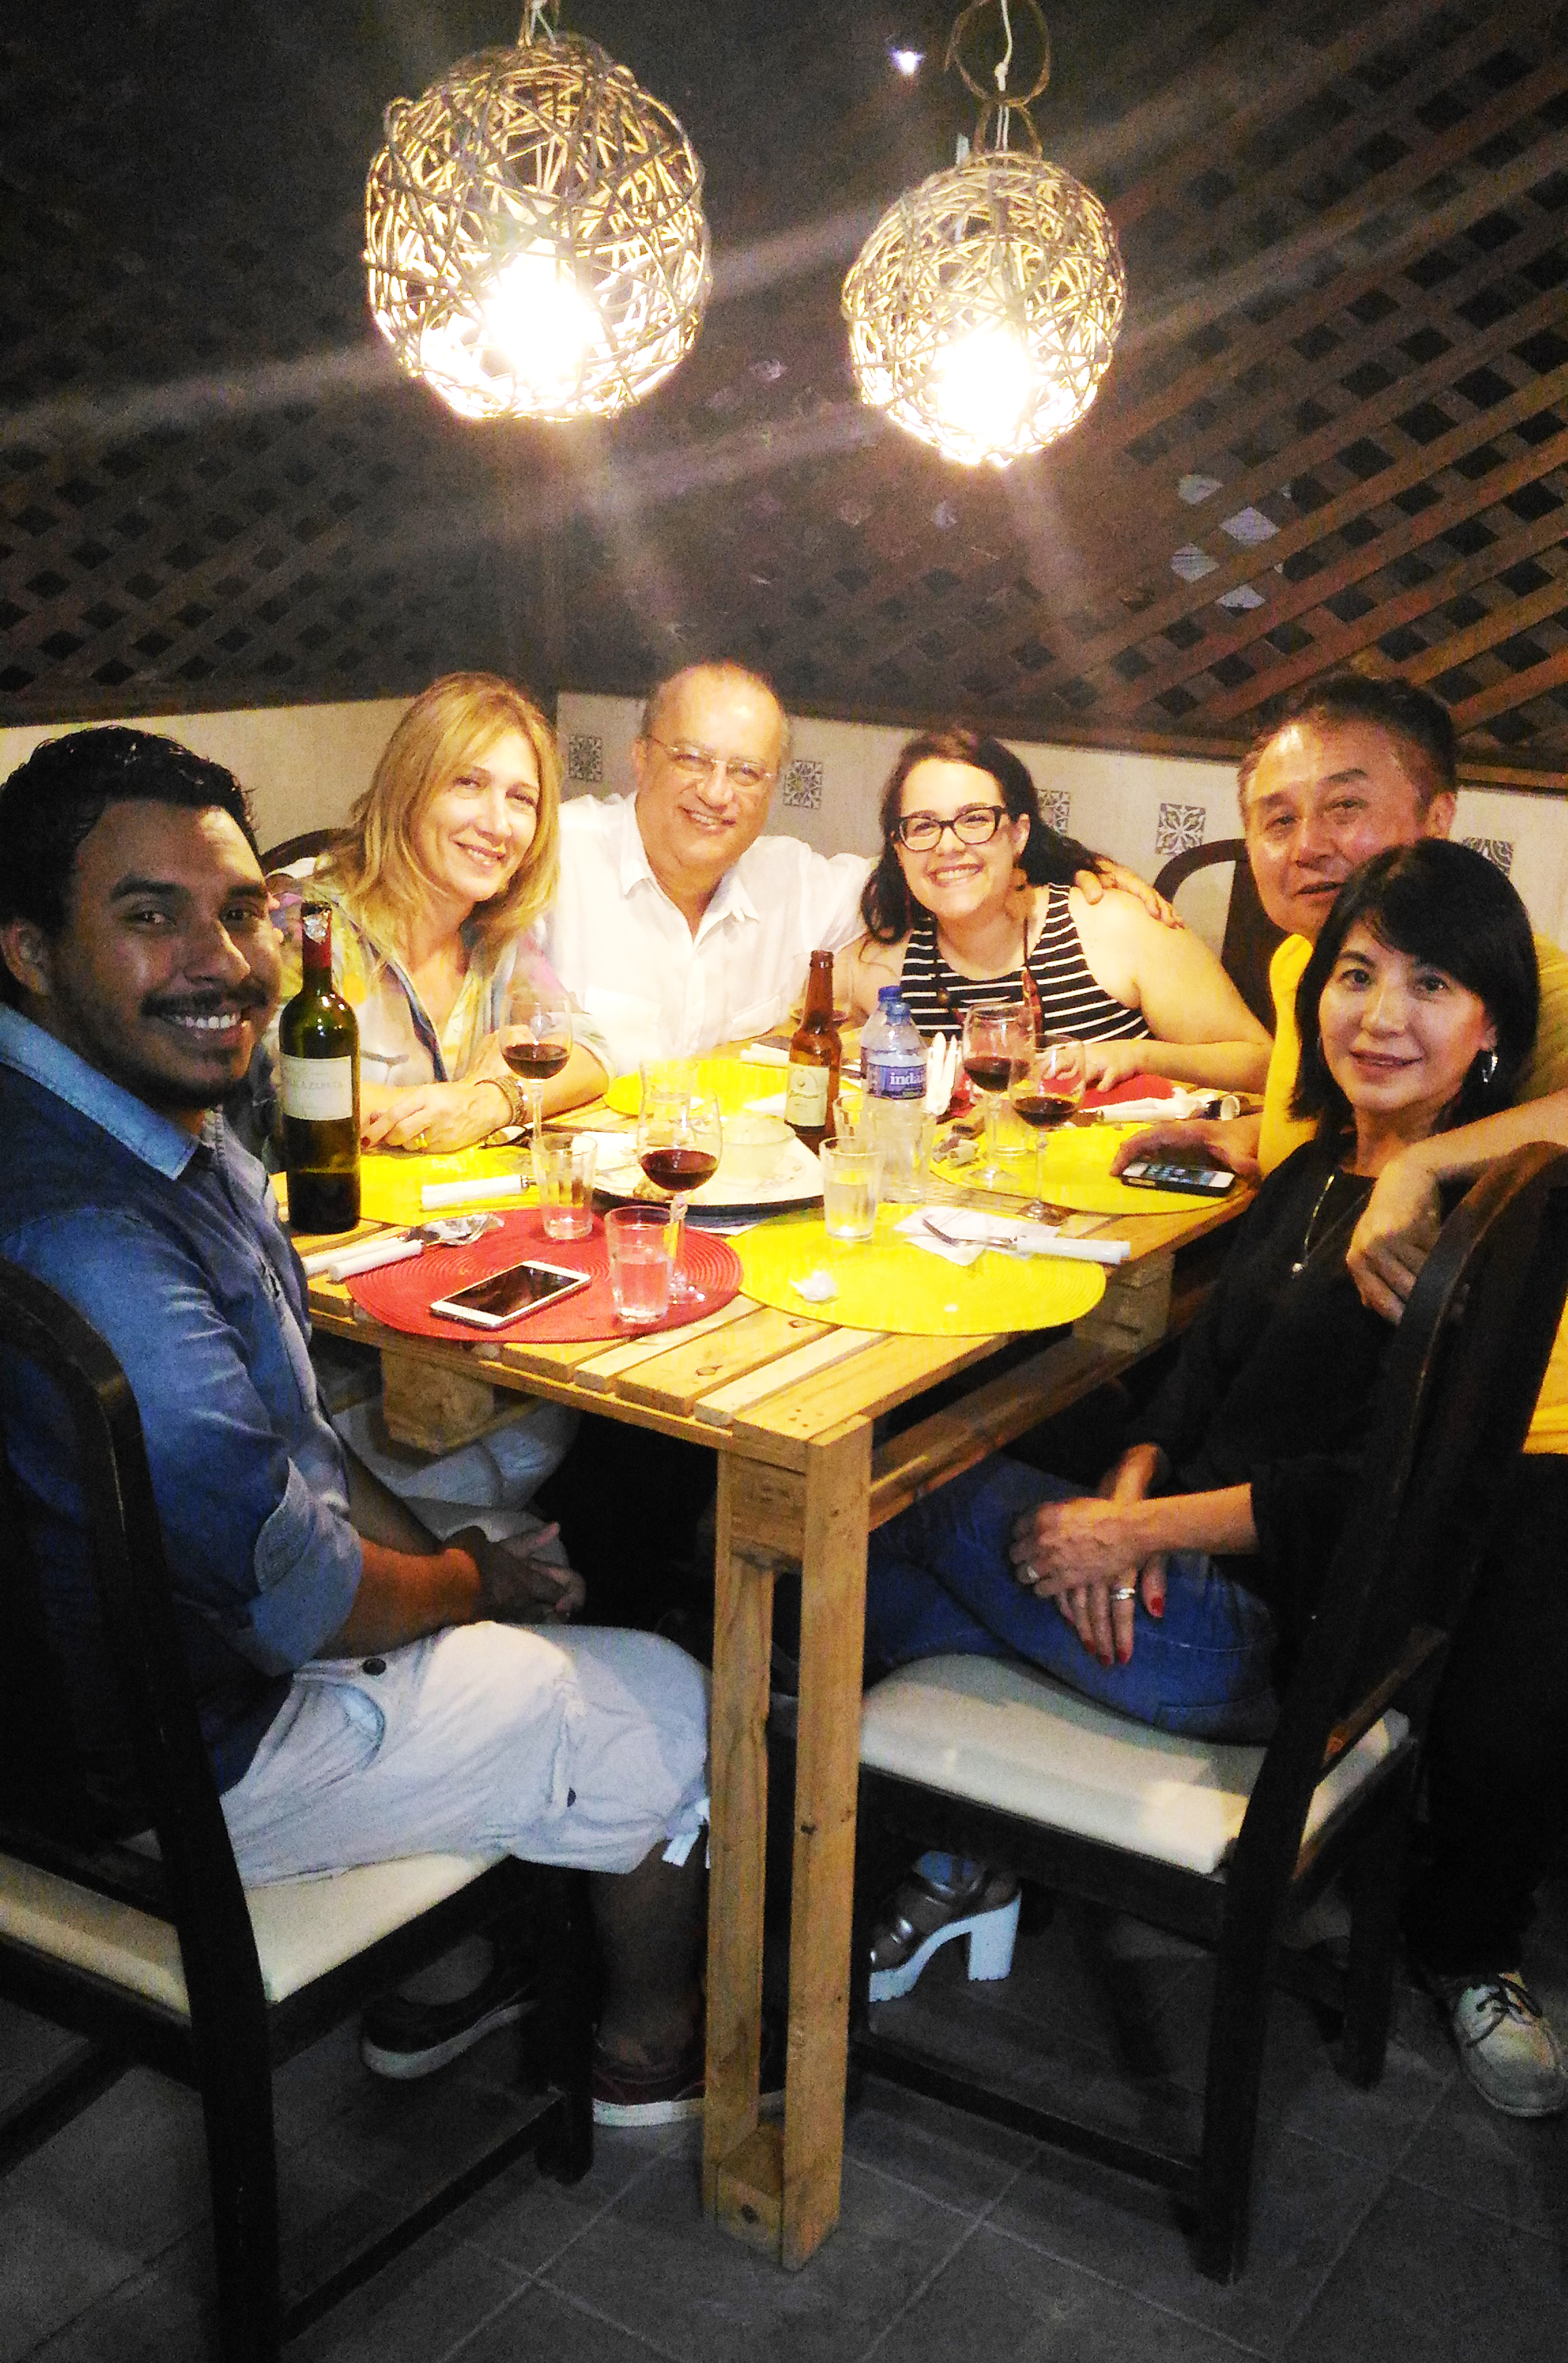 Da esquerda pra direita: Elon Nepomuceno, Eliane Marzano, Ruy Lima, Ariane Cajazeiras, Elcio Nagano e Miriam Kina